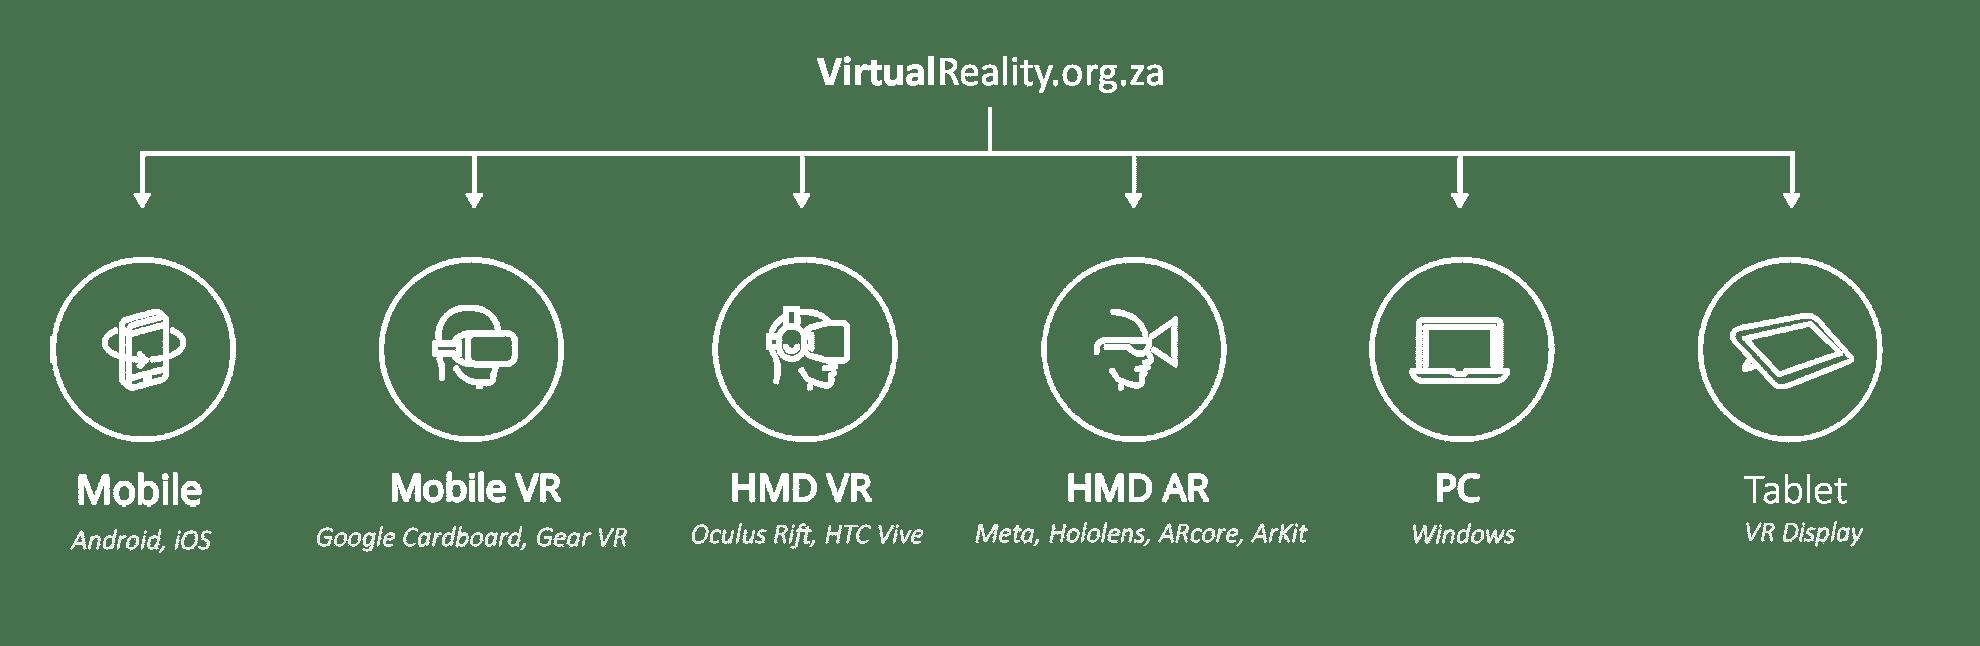 vr-technologies